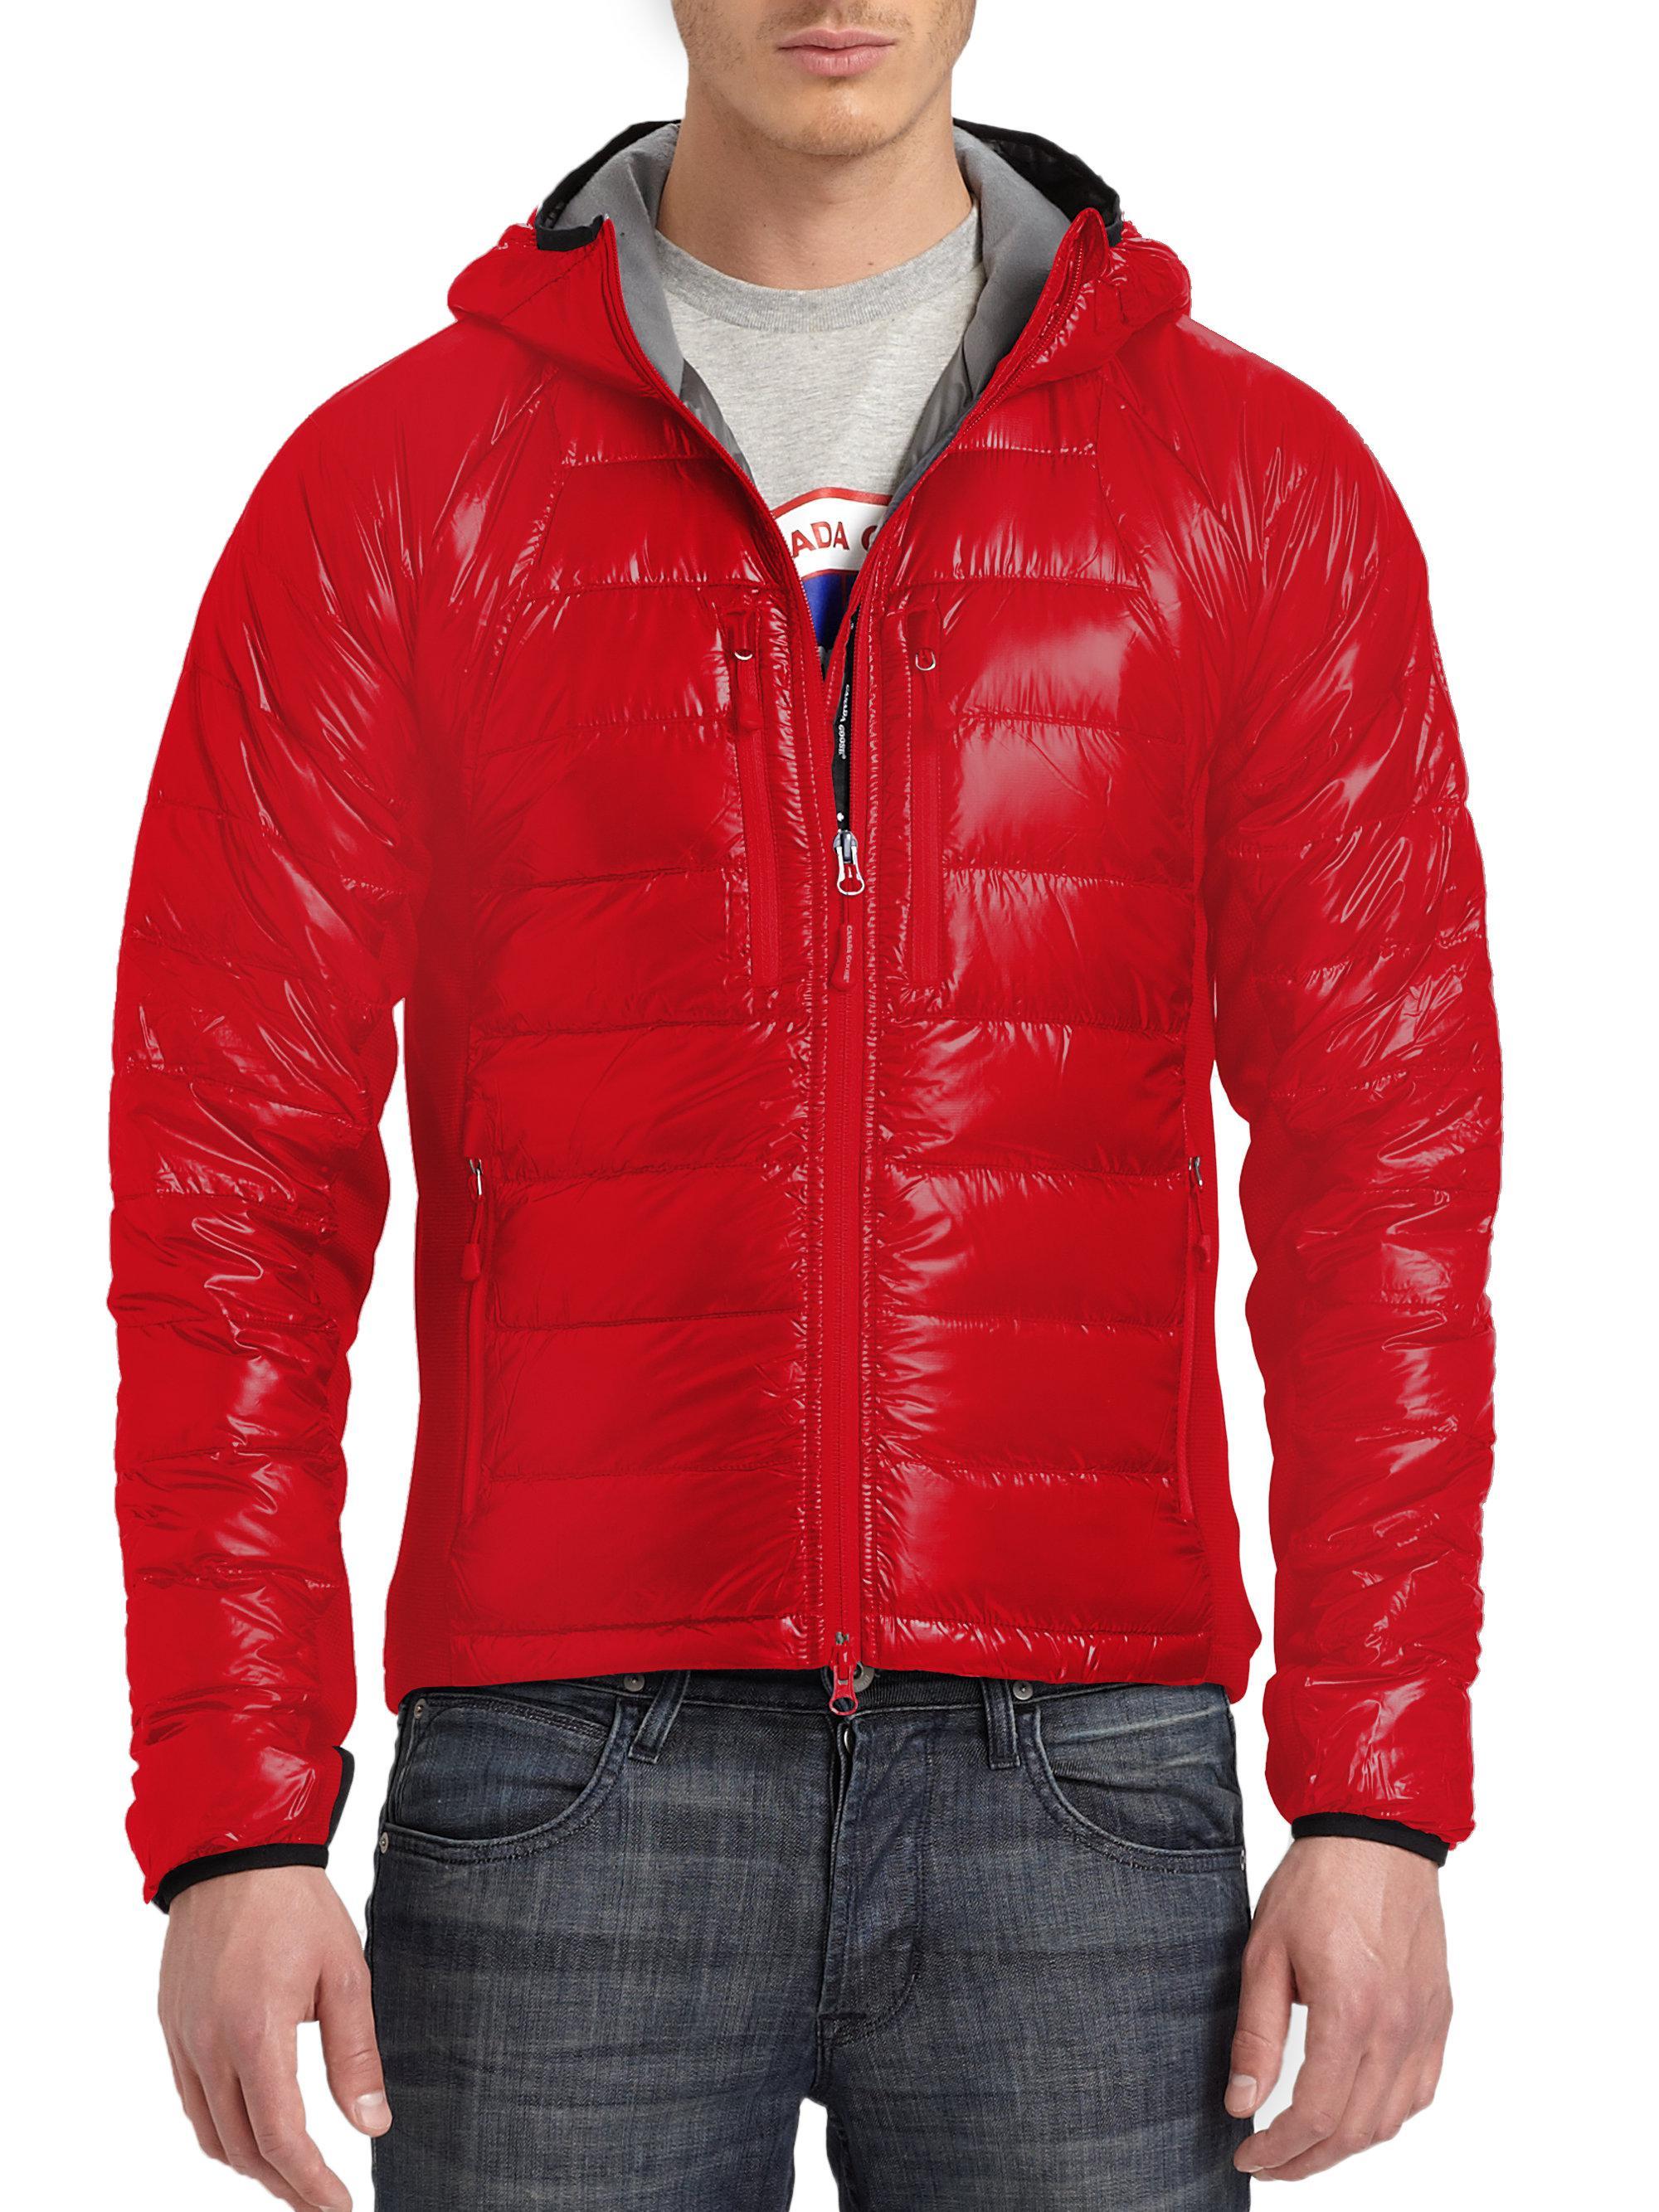 Canada Goose HyBridge Hoody Red